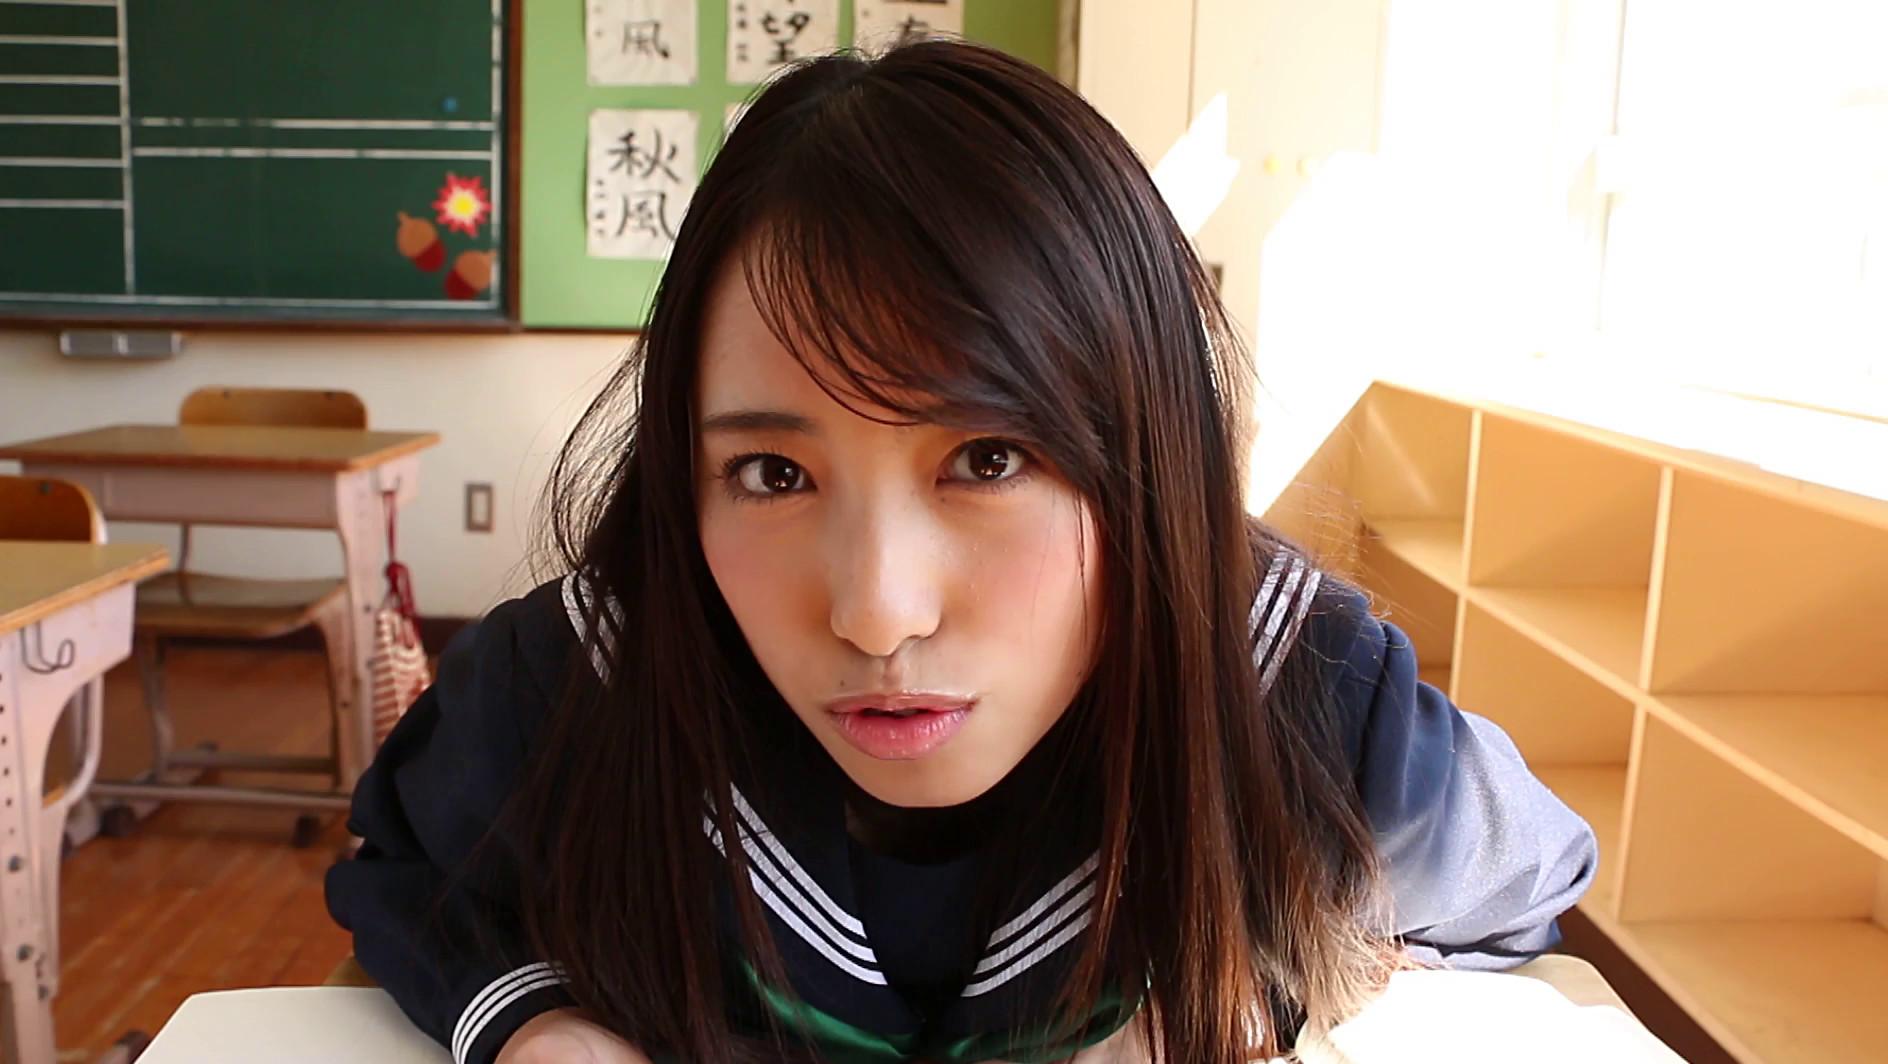 桜舞う恋 高梨瑞樹1